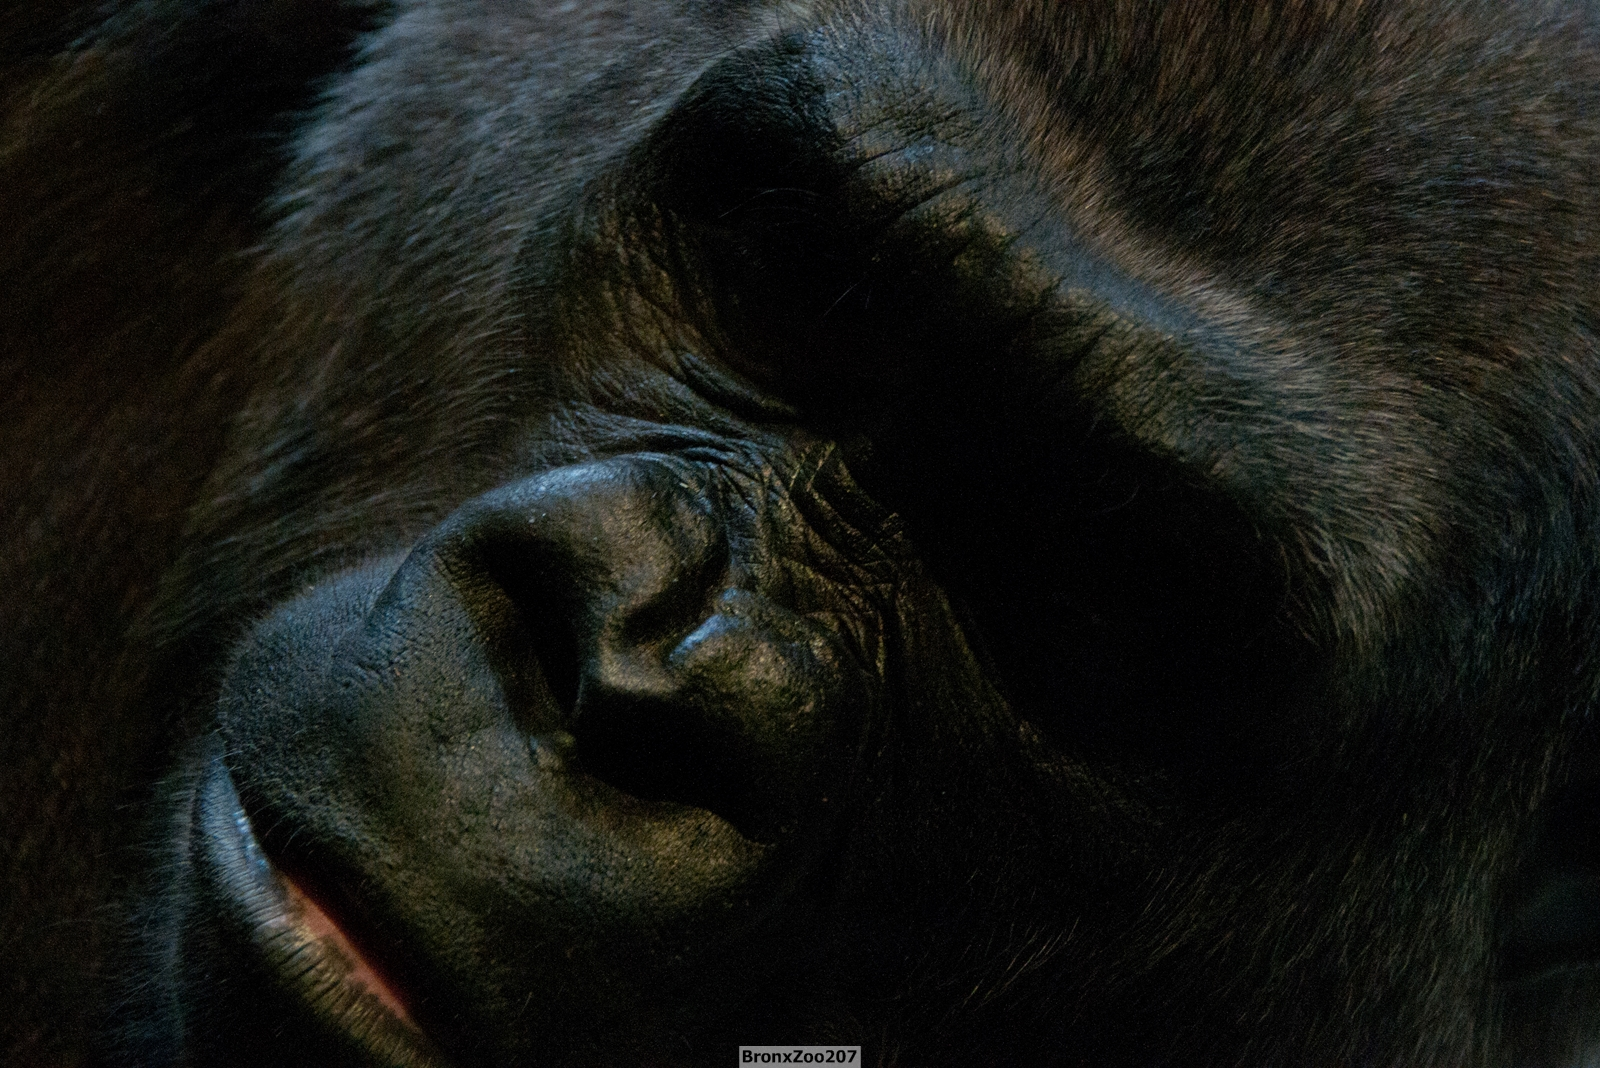 Gorilla04-004.jpg